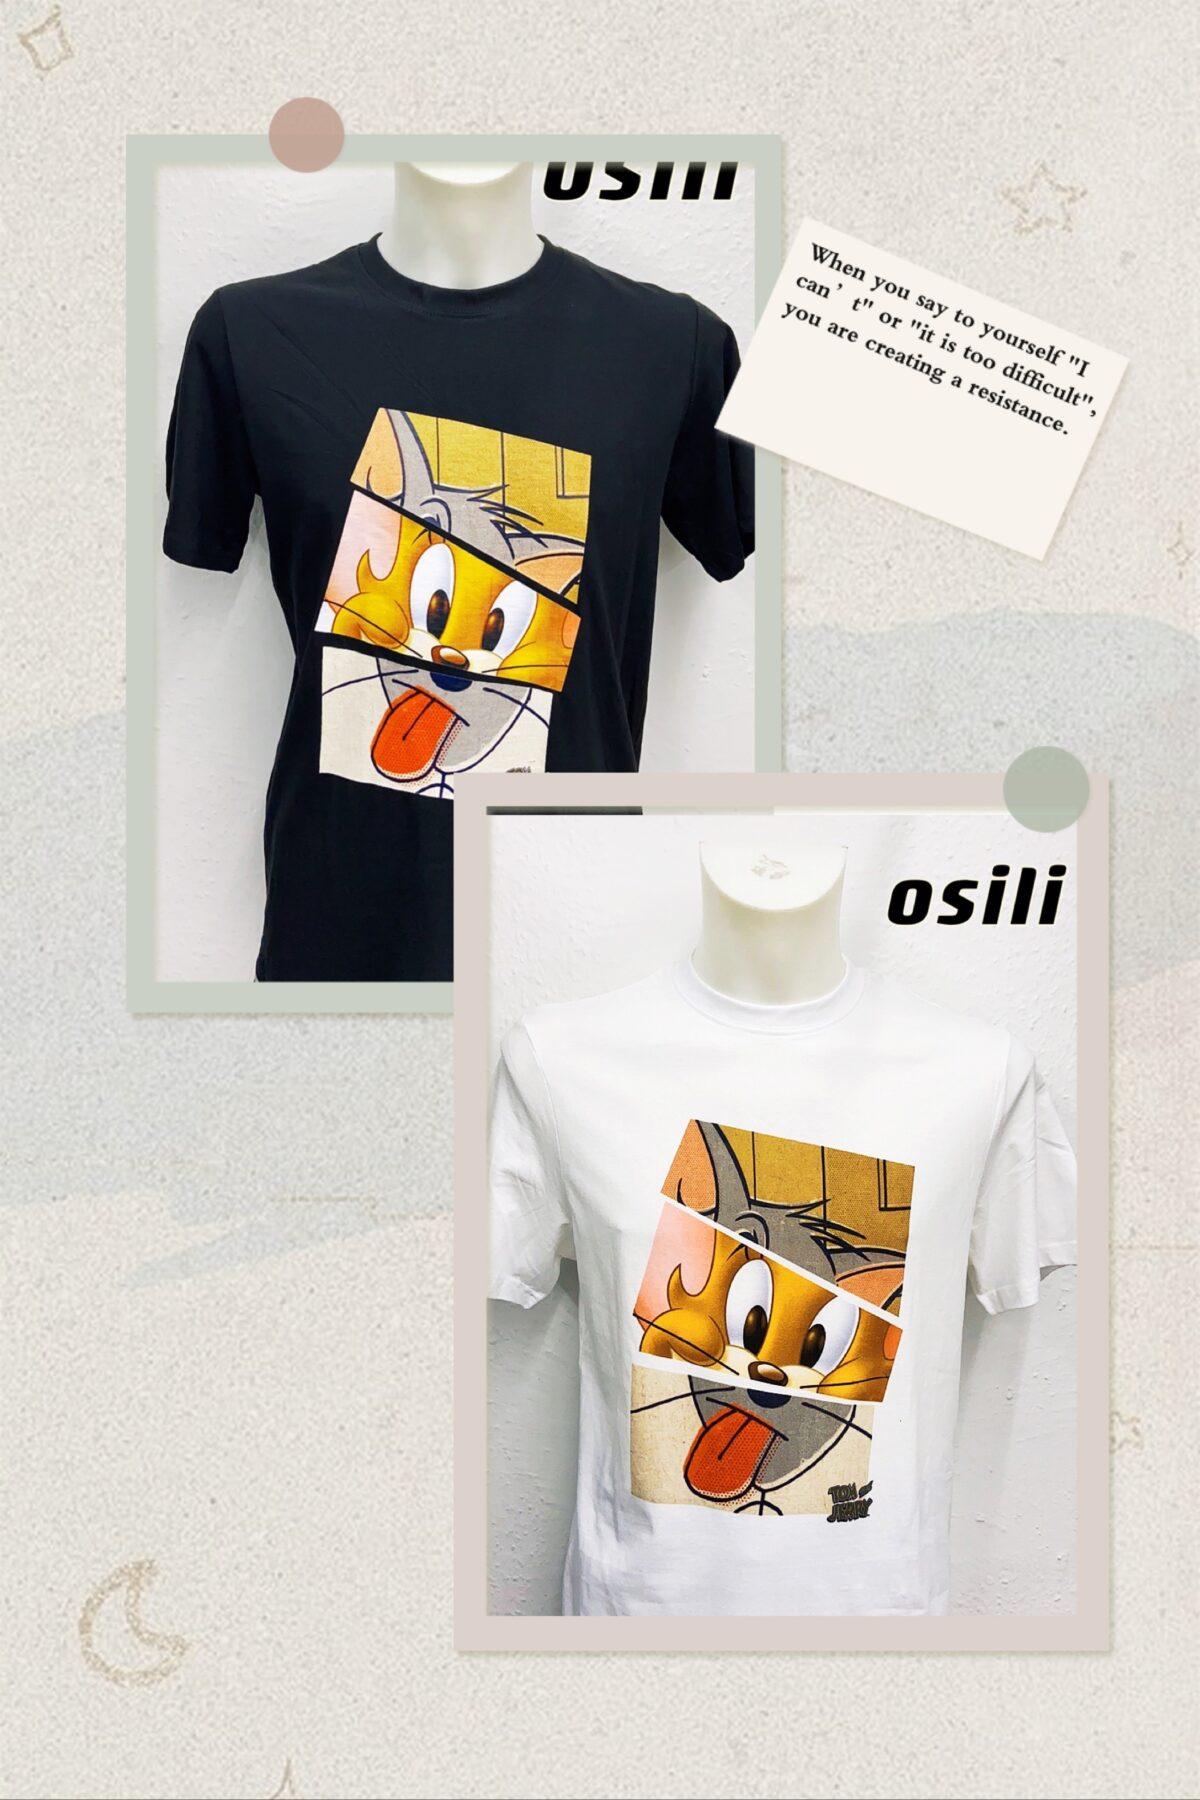 85B53BFB EA12 4475 8ED7 FAF8CAD0A4B0 scaled Osili - Fashion - Divat